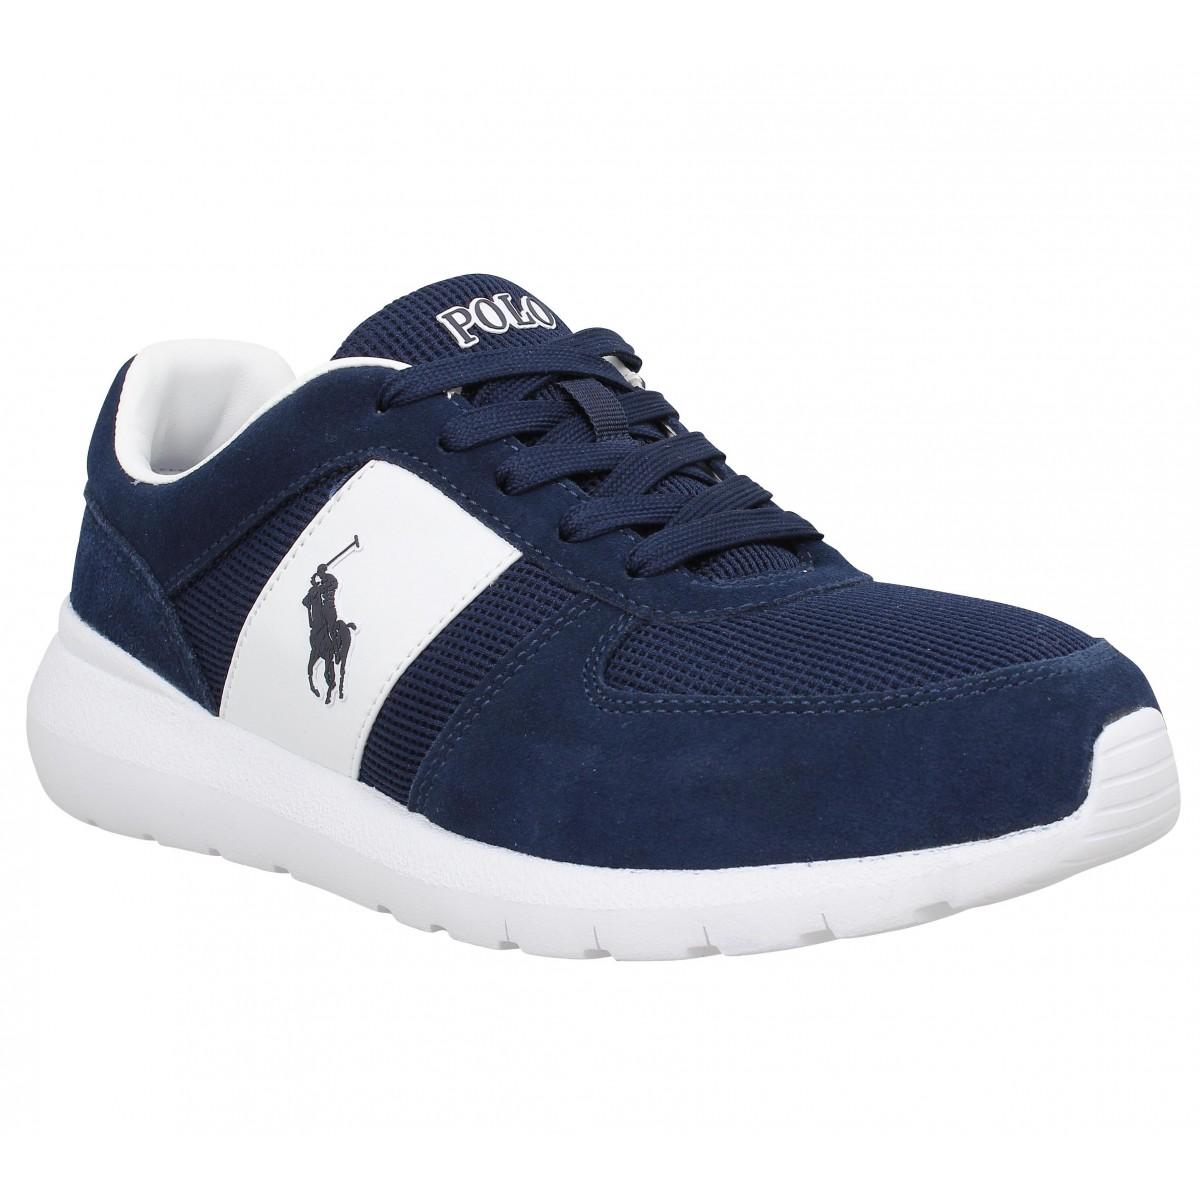 Polo ralph lauren cordell marine homme   Fanny chaussures 3e85ed027e2a